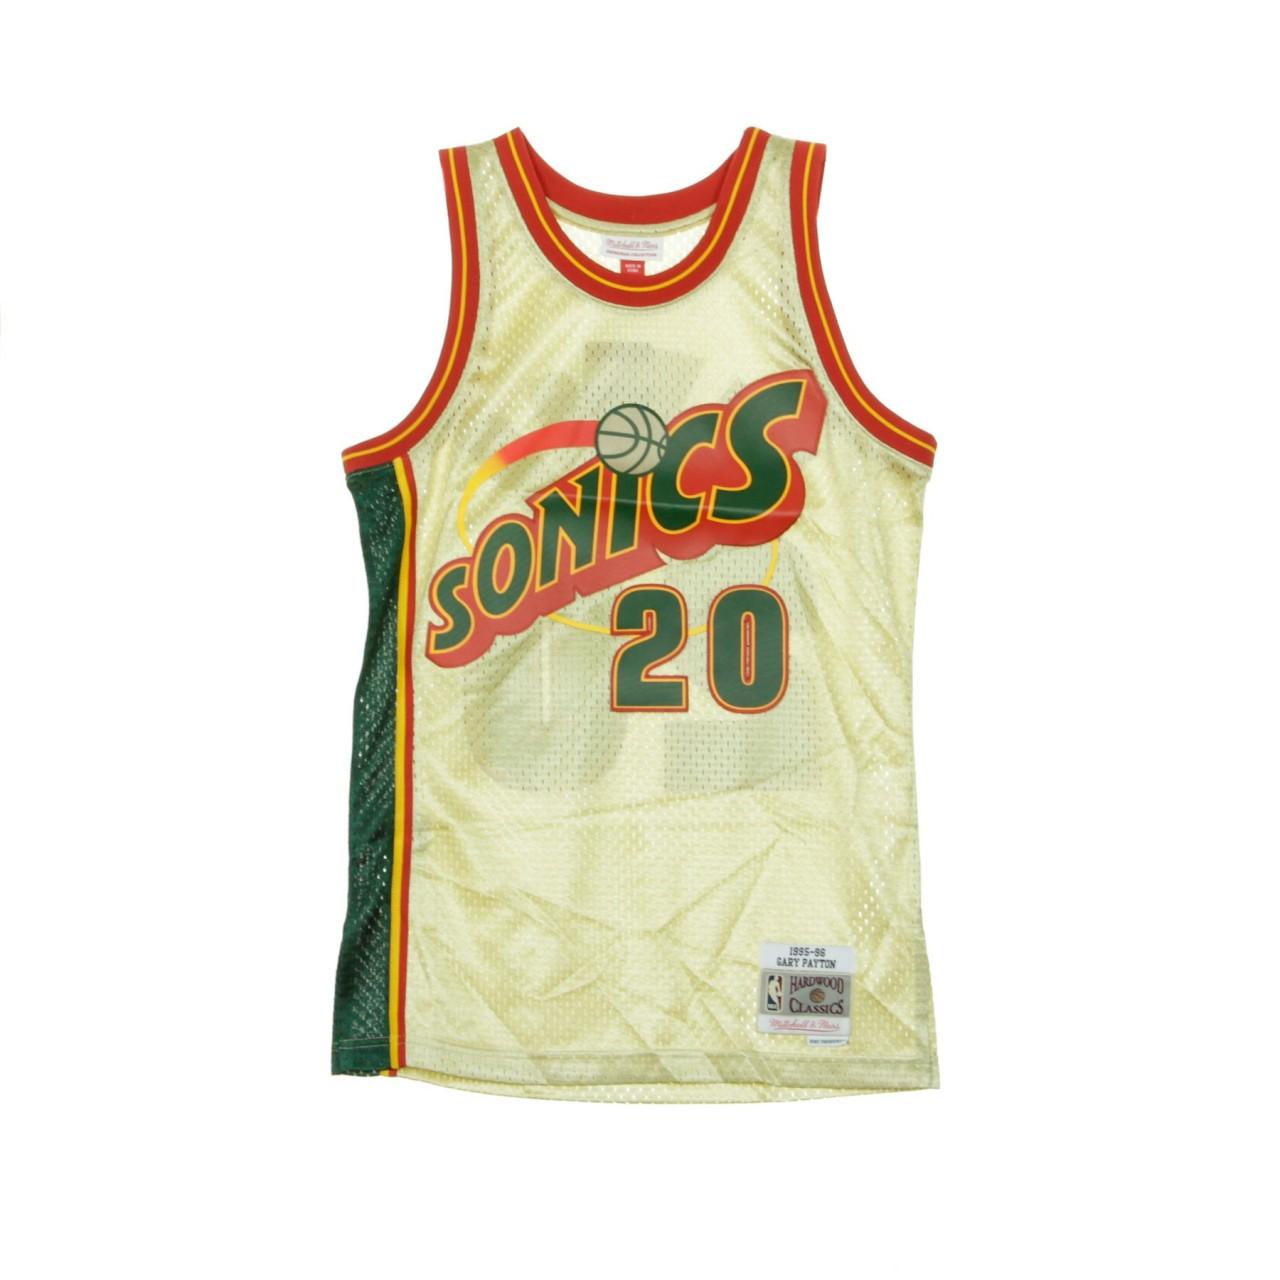 MITCHELL & NESS NBA SWINGMAN JERSEY GARY PAYTON NO.20 1995-96 SEASUP GOLD BA895M-SSU-D-L3W